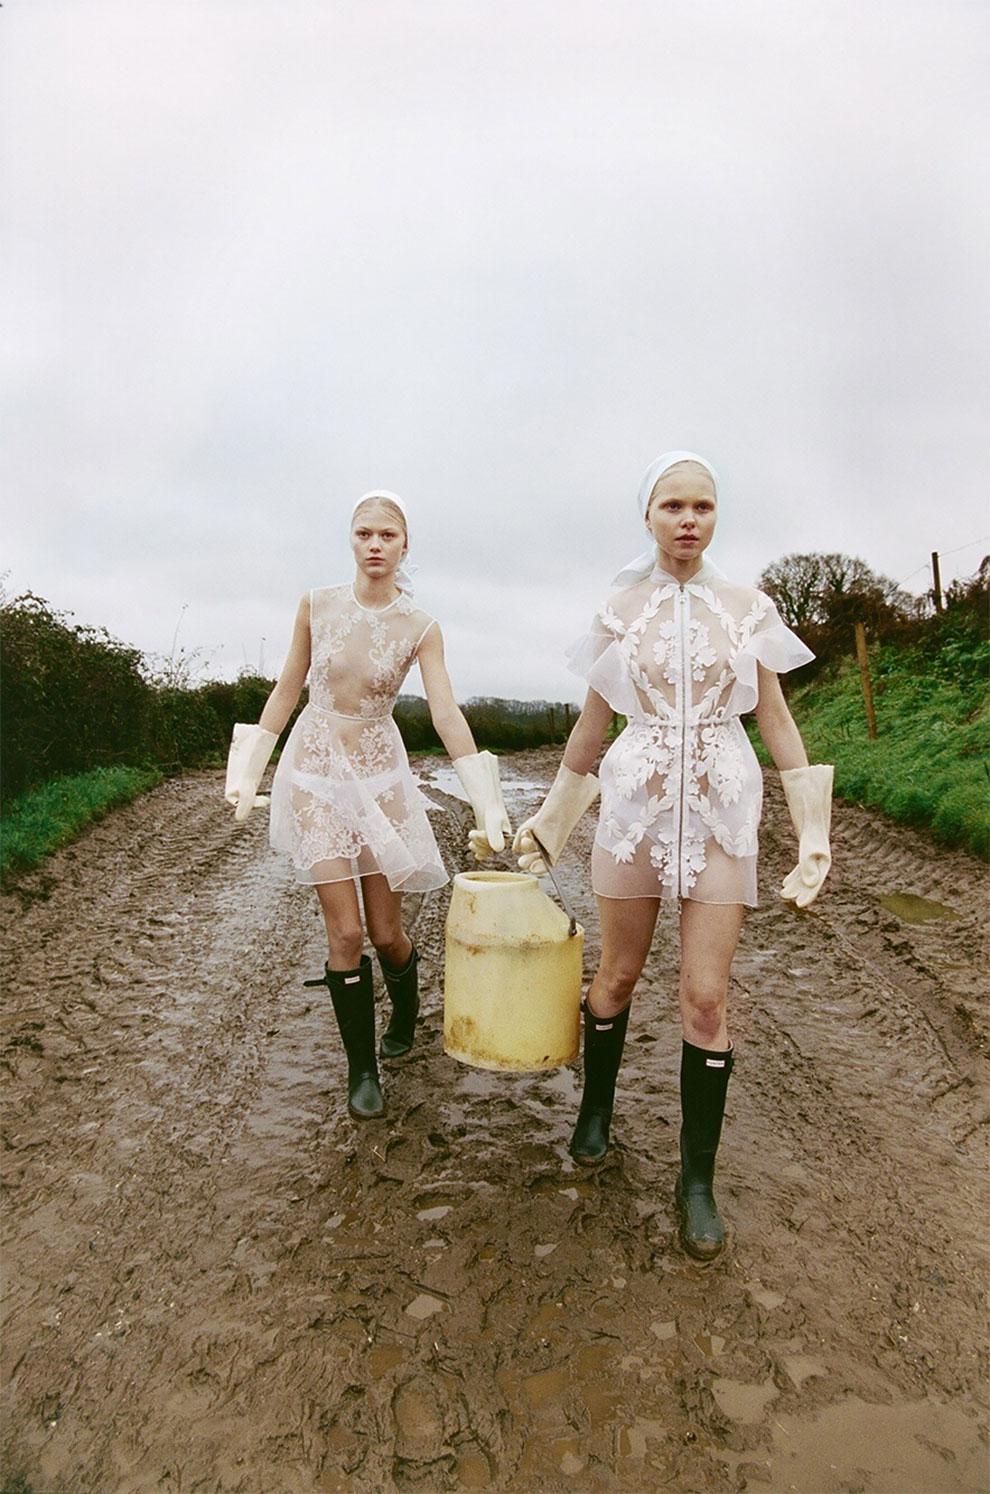 Чешский фотограф Михал Пуделка девочки, девочки, девочки (10).jpg